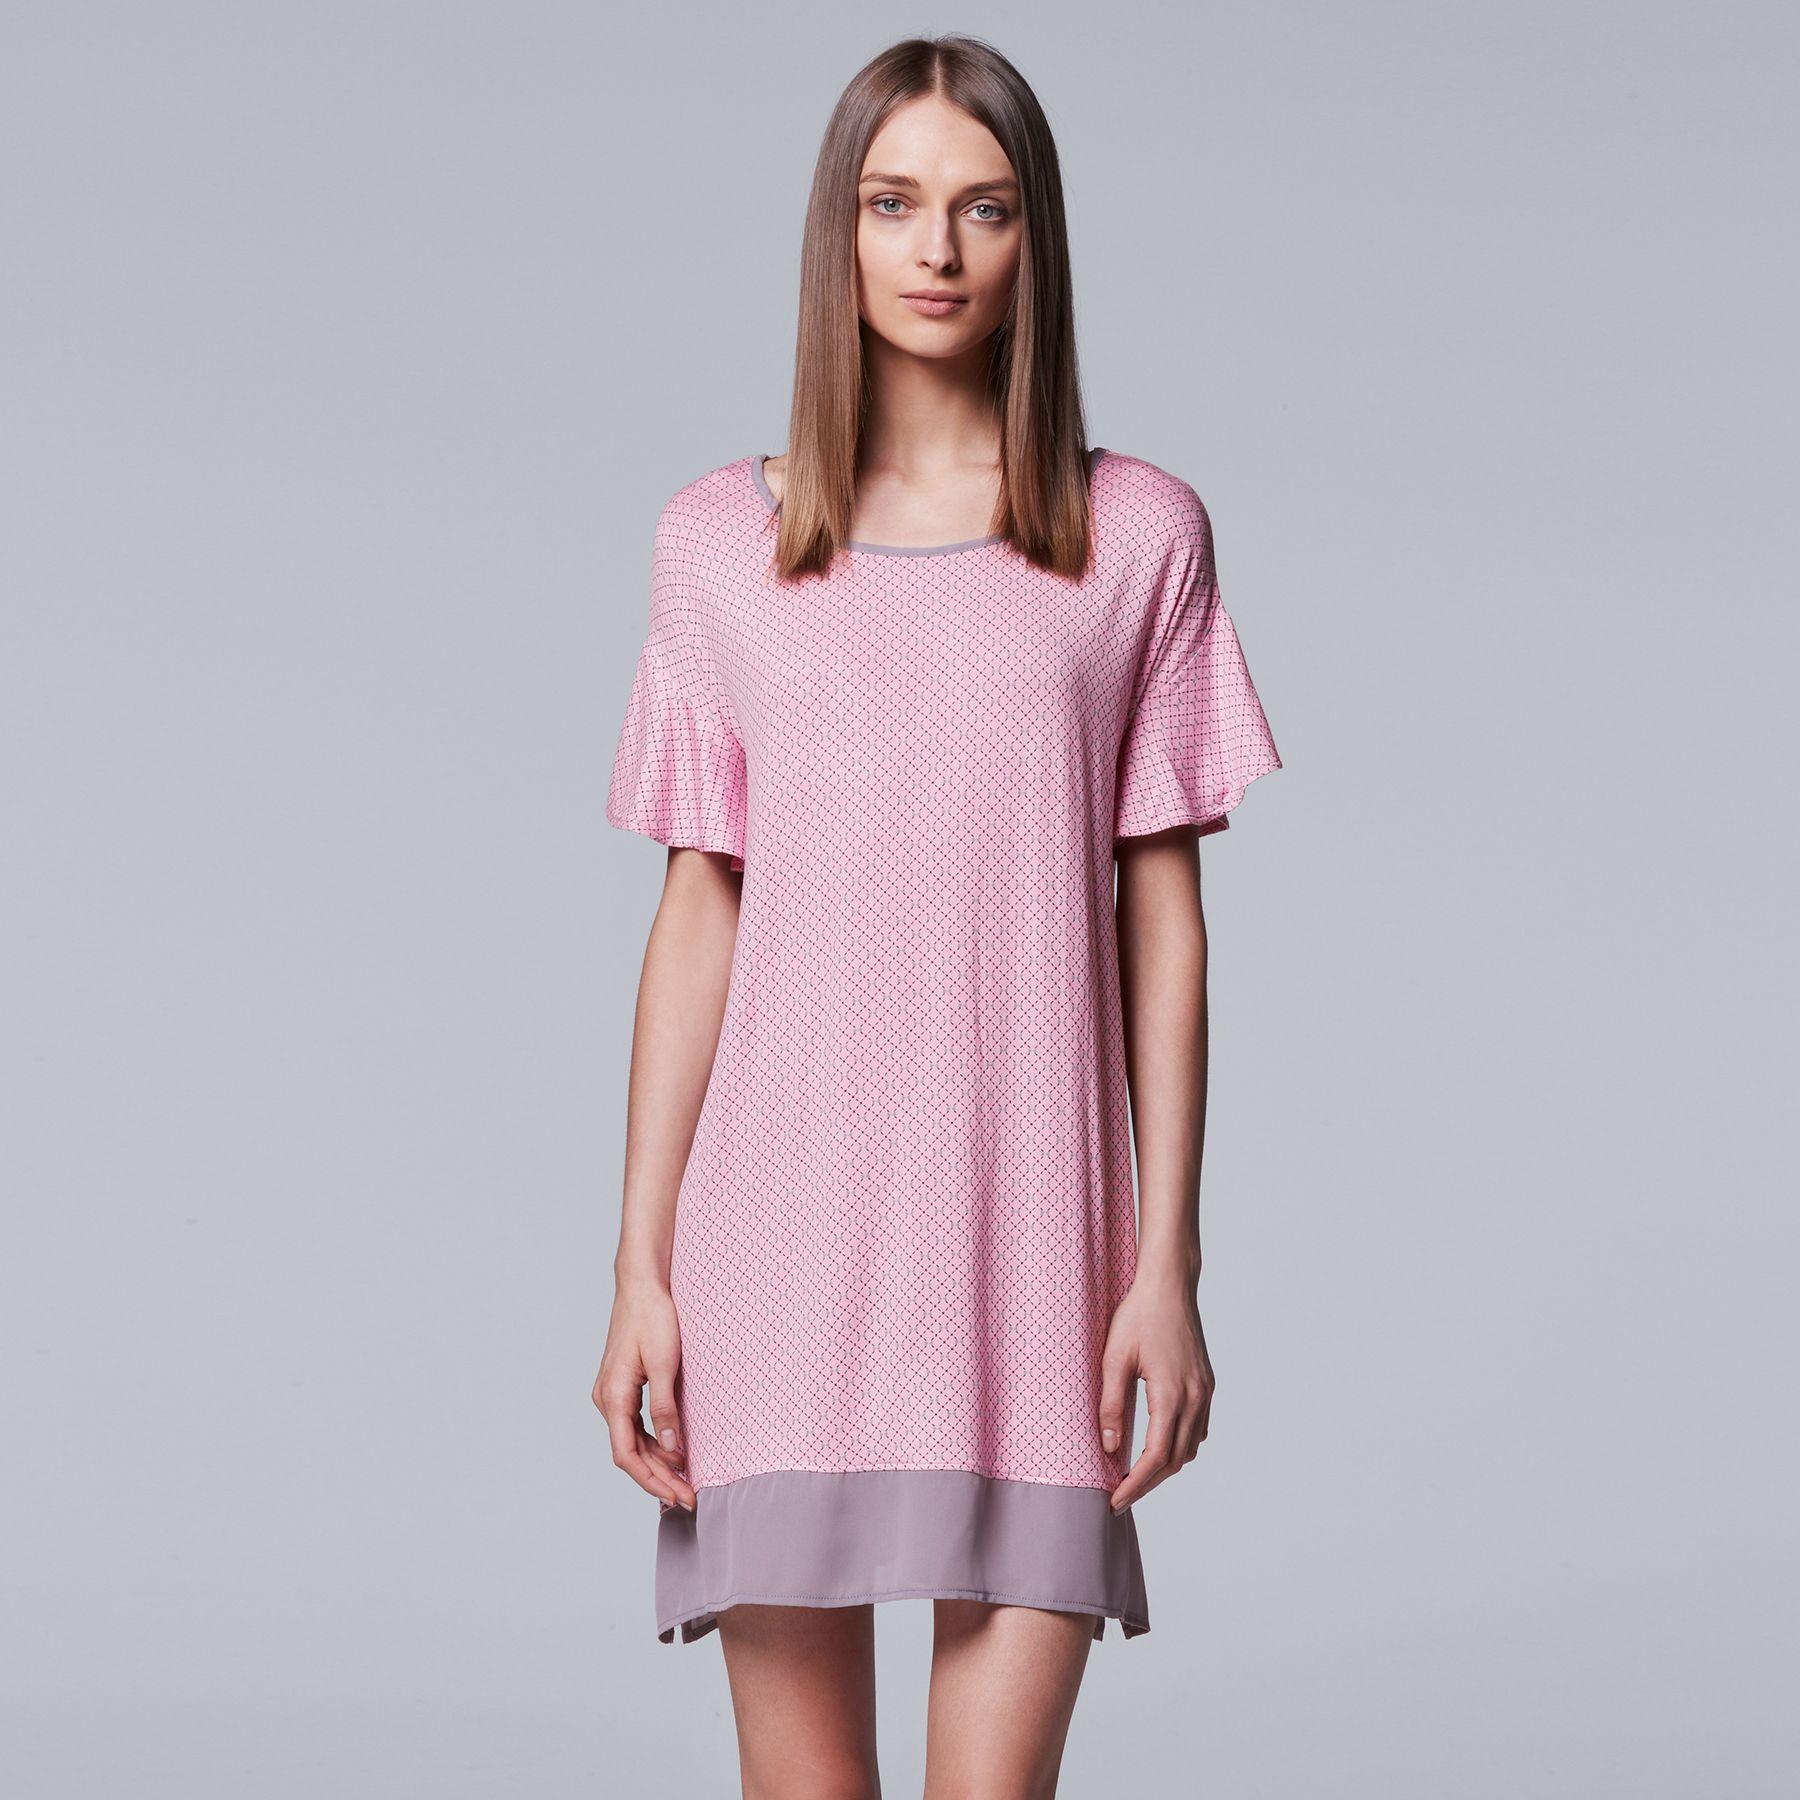 Vera Wang Robe_Other dresses_dressesss